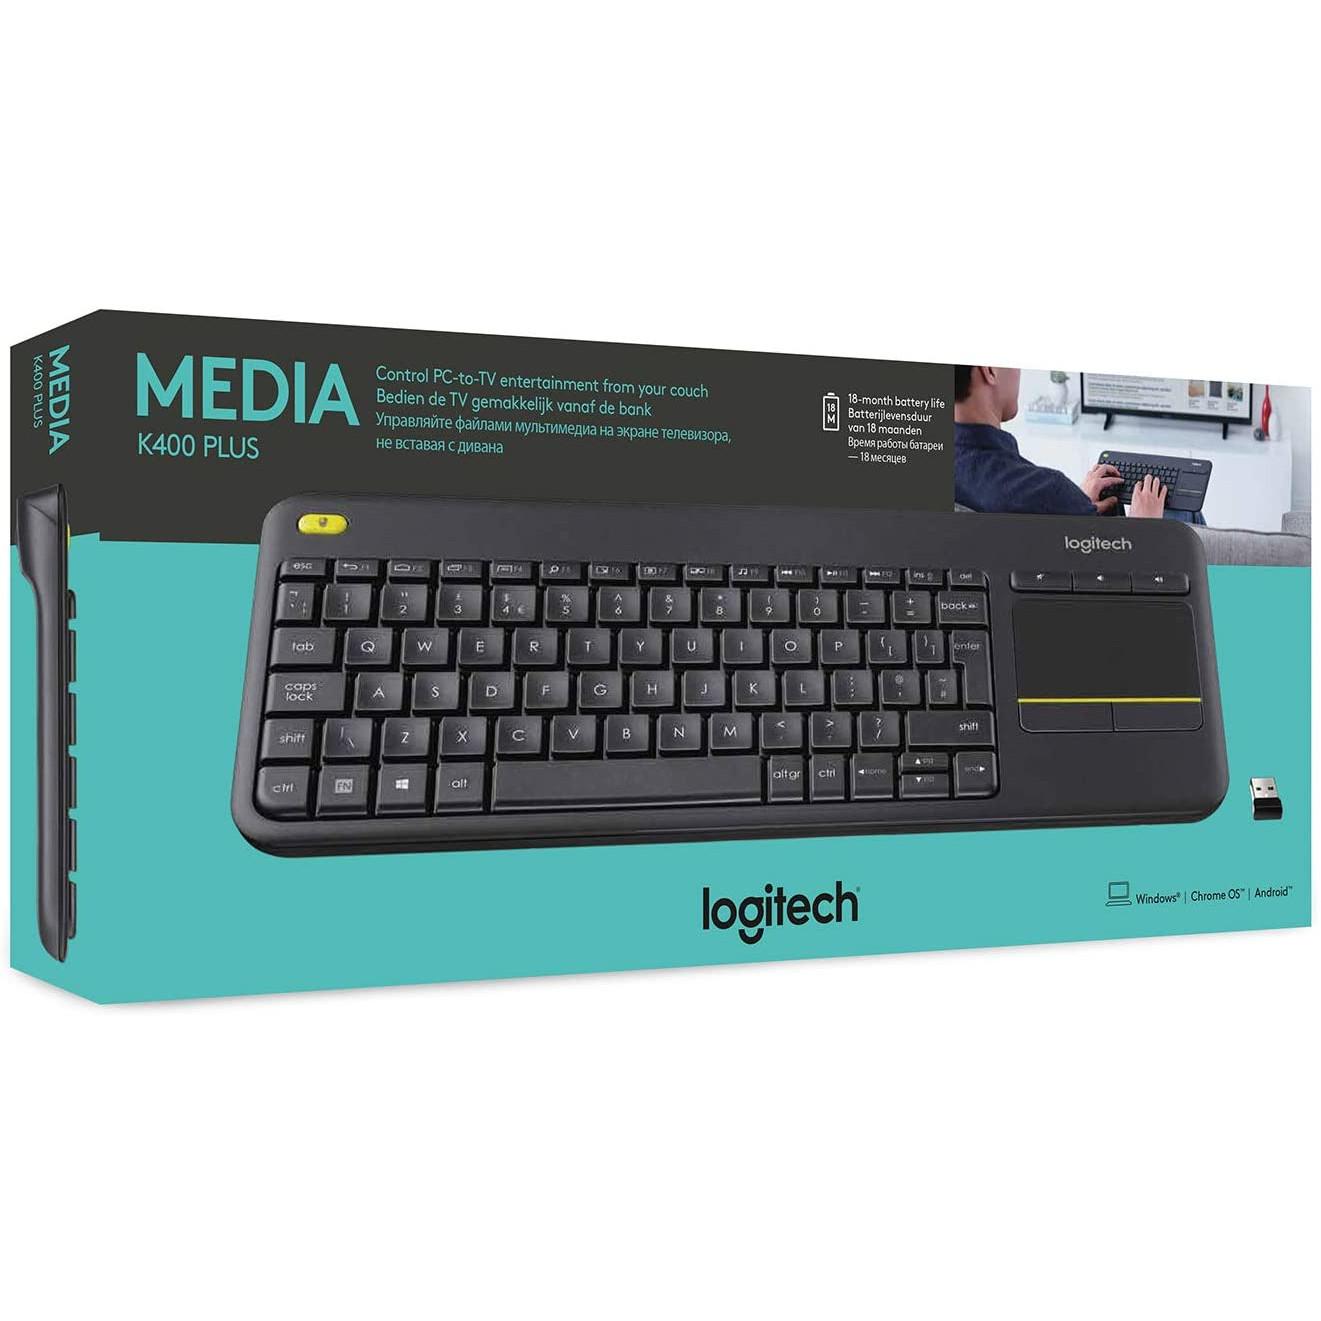 Logitech-K400-Plus-Wireless-Touch-HTPC-Keyboard-Media-Friendly-TV-All-Colours-VS thumbnail 7